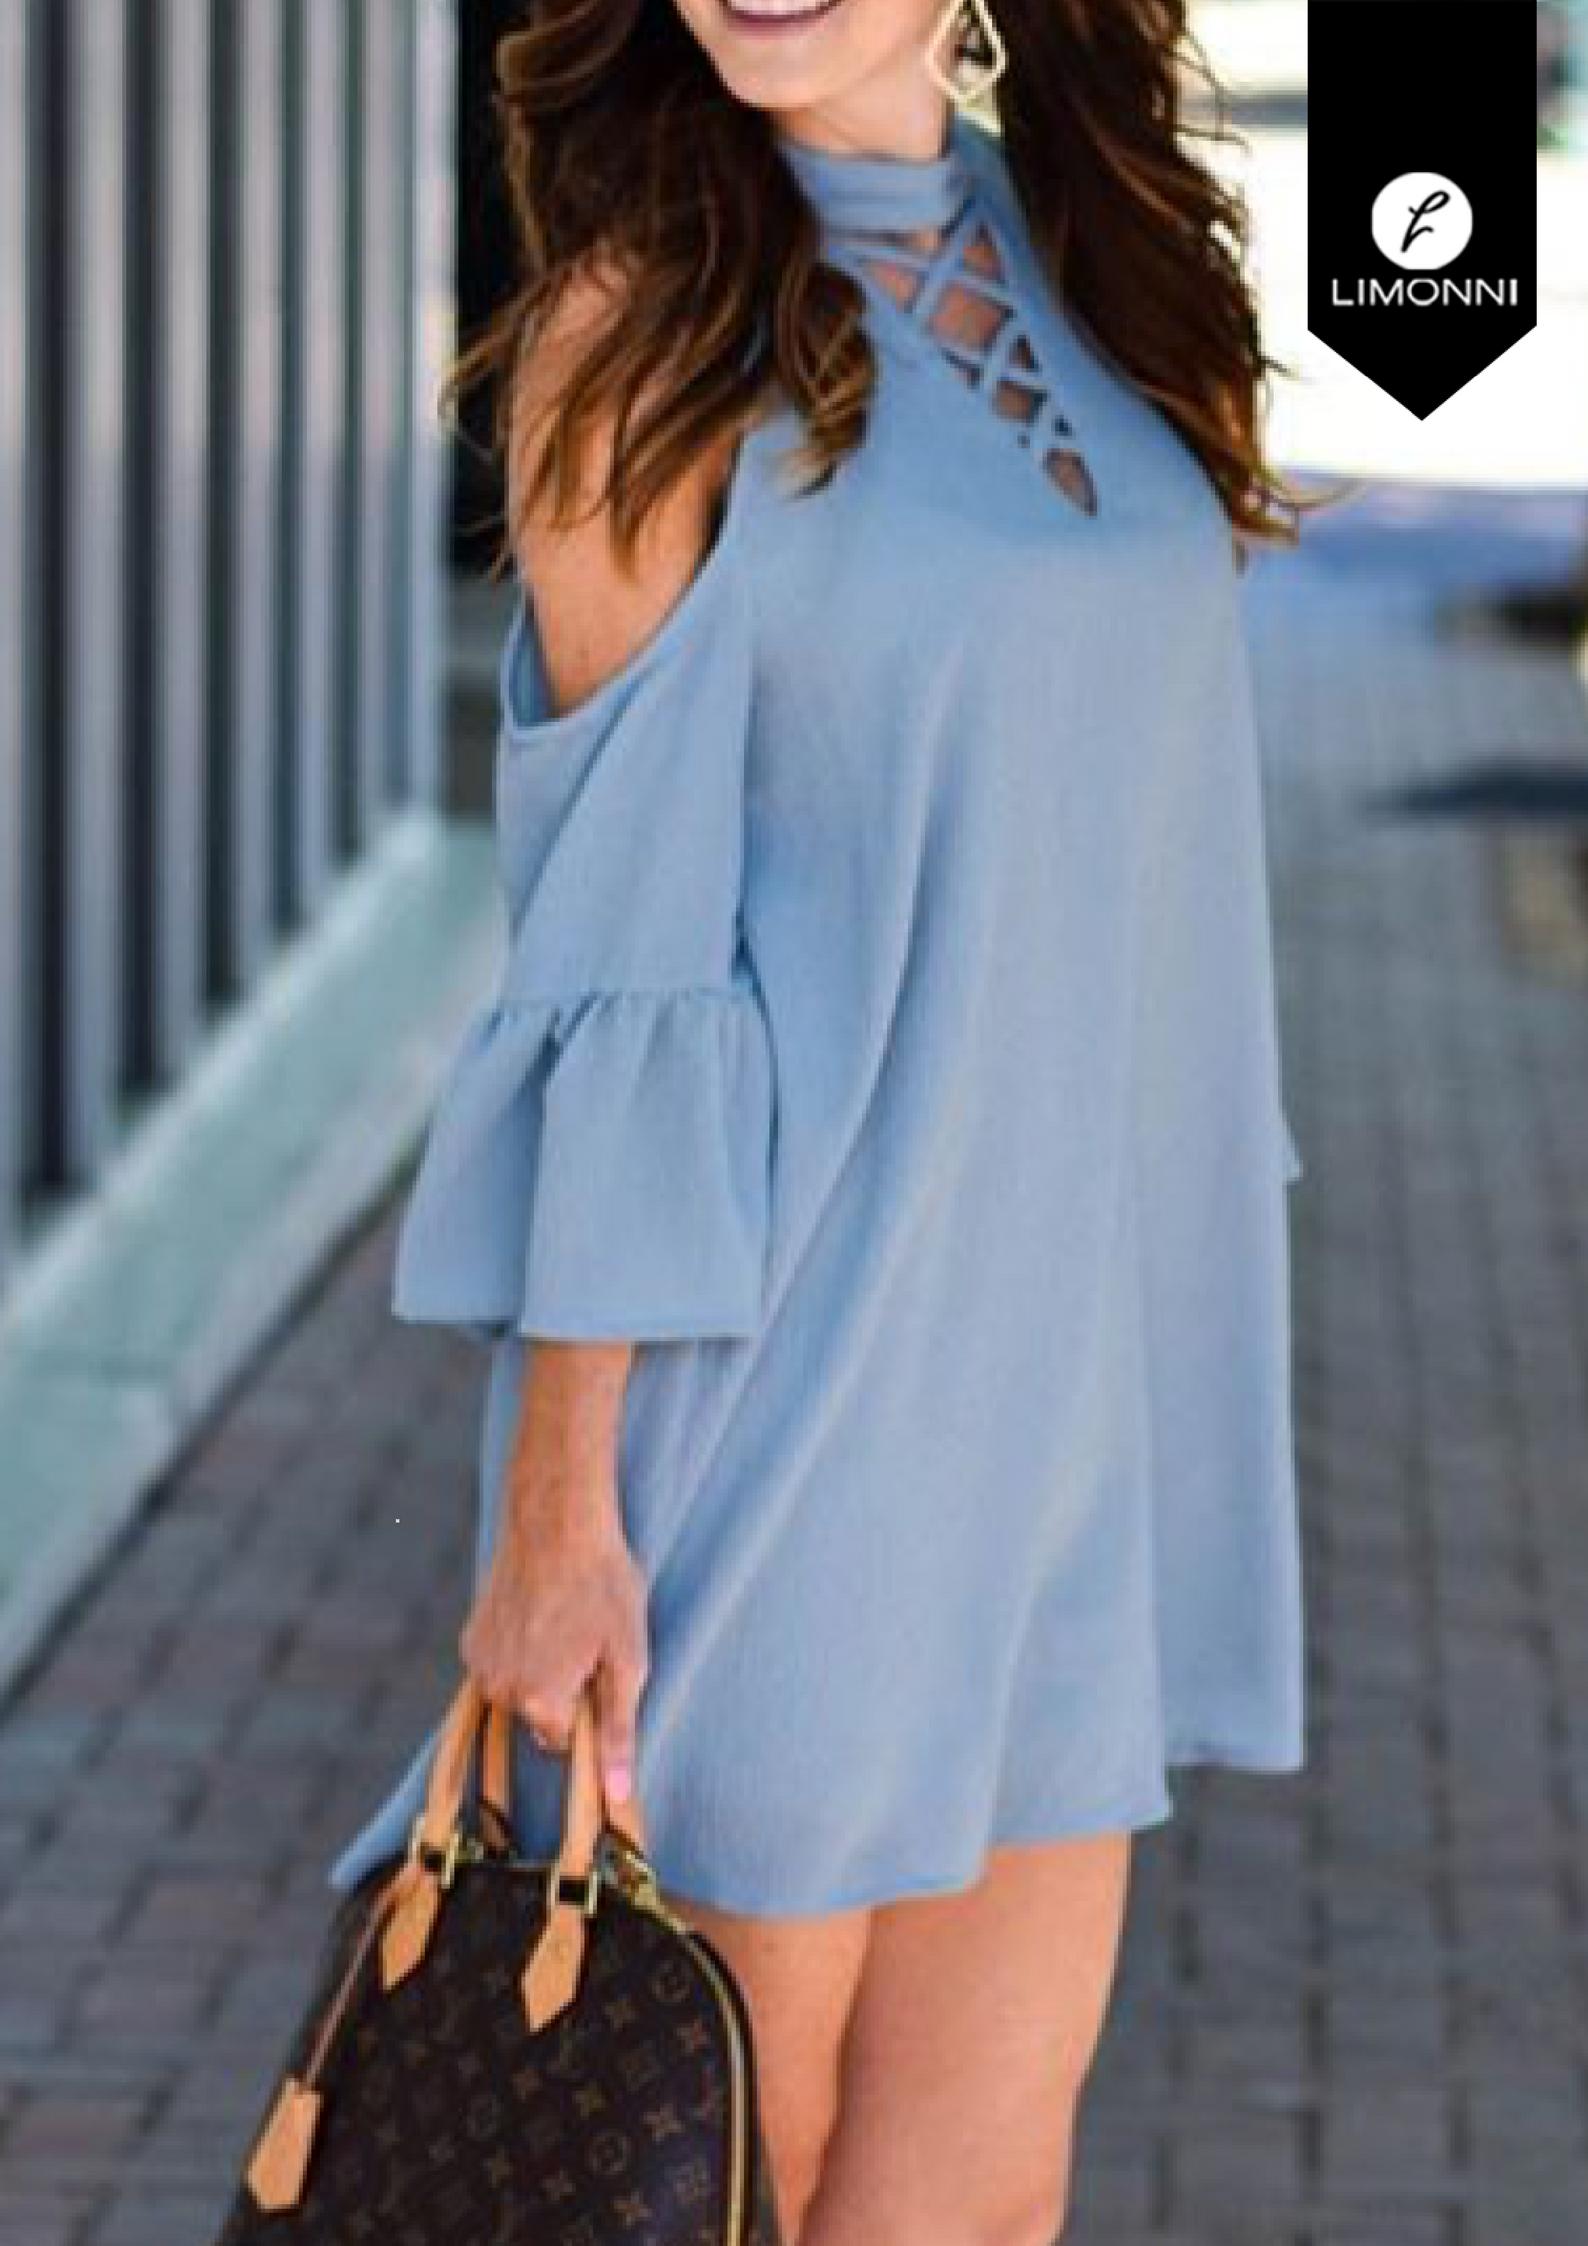 Vestidos para mujer Limonni Bennett LI1315 Cortos Casuales